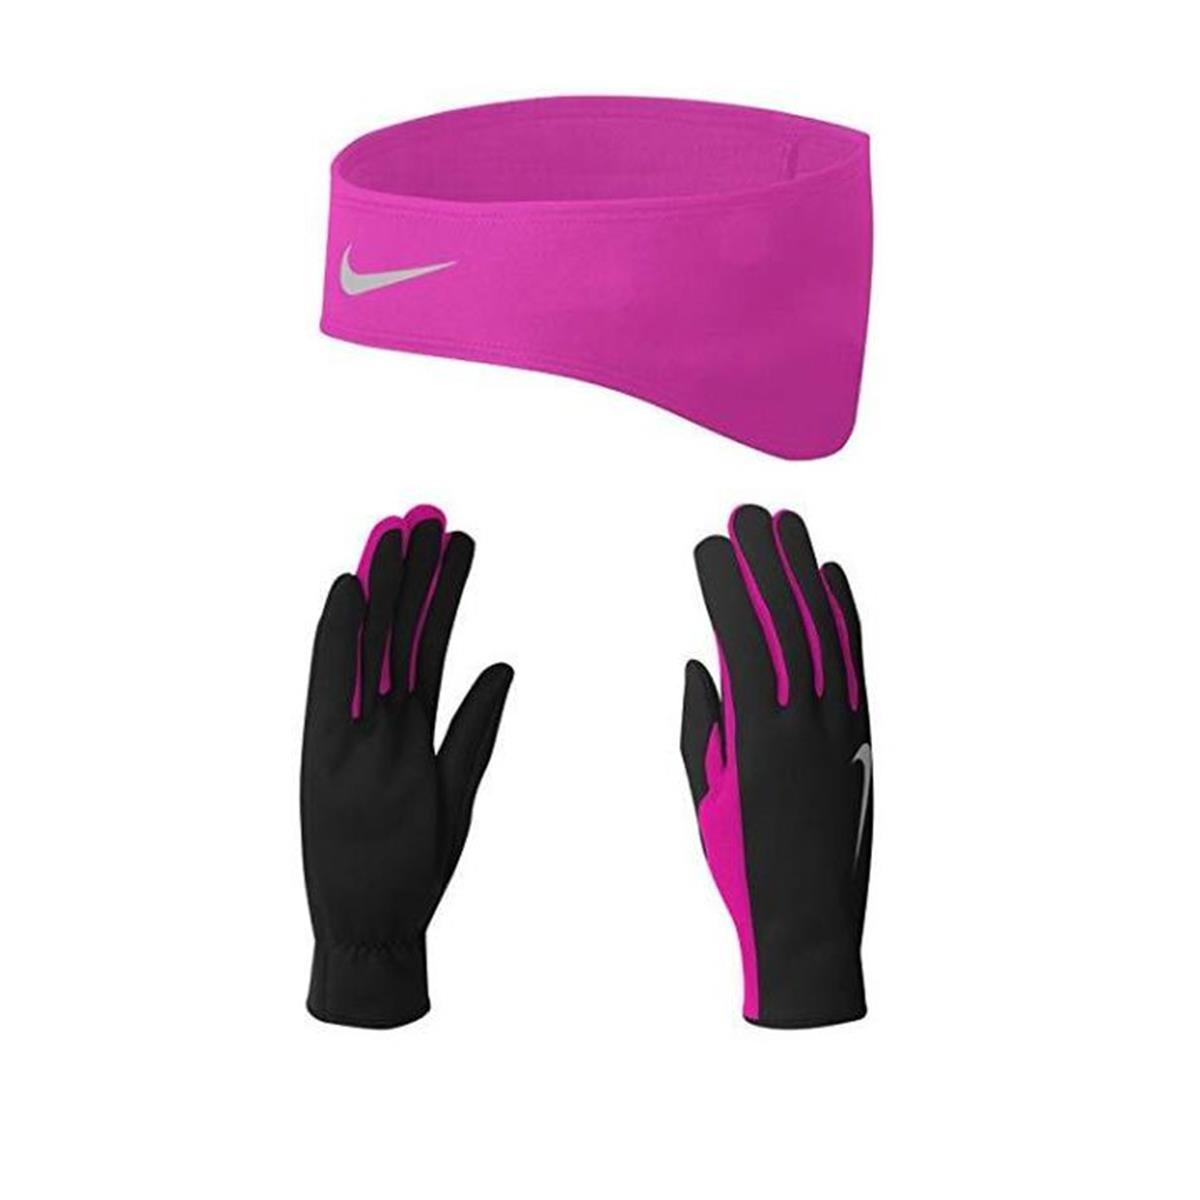 Nike Running Gloves Sports Direct: Nike Dri-Fit Headband And Glove Set Womens (Black-Pink